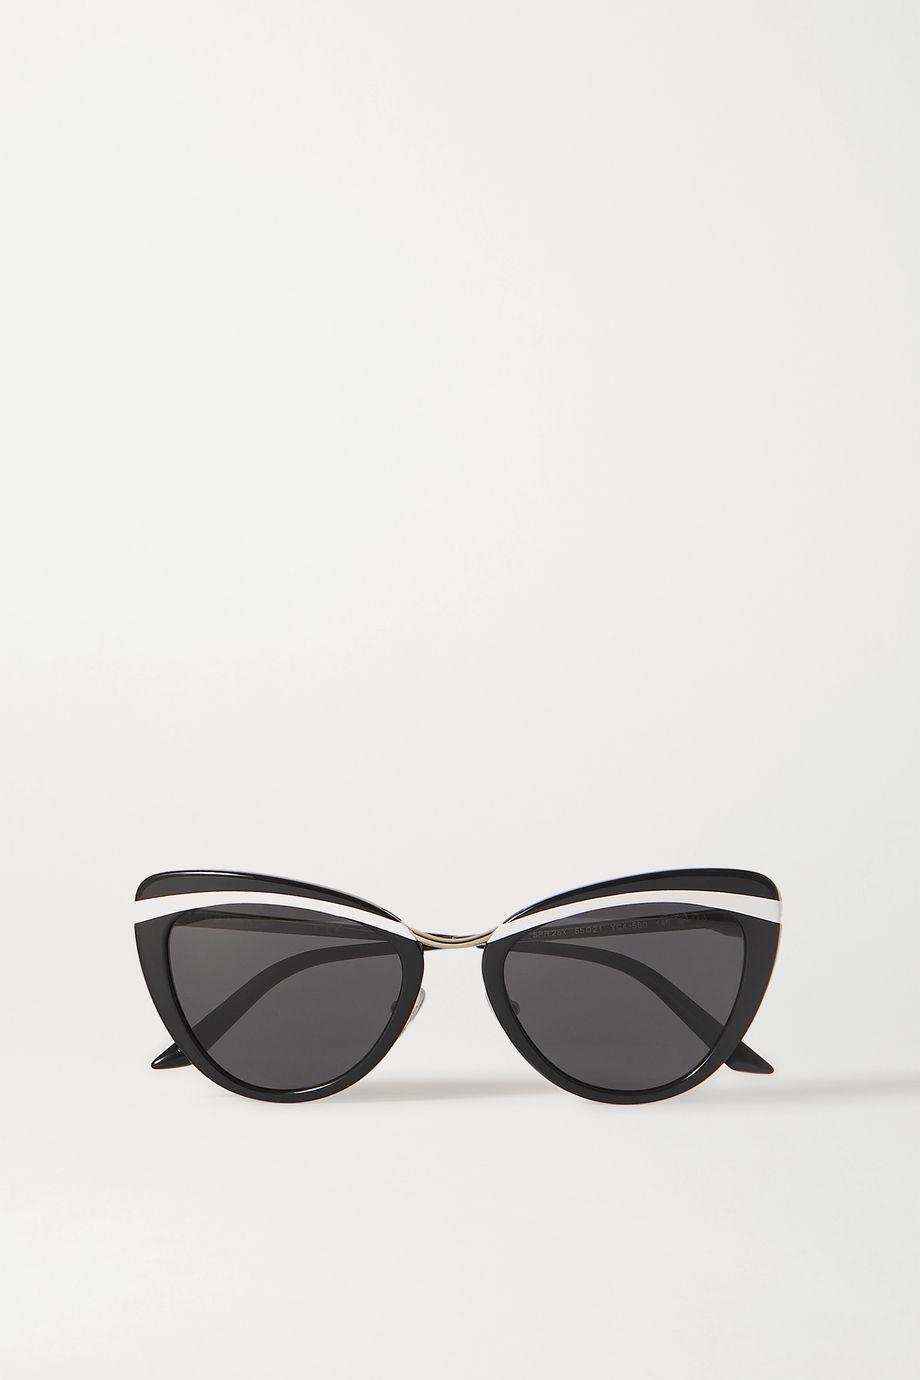 Prada Eyewear Cinema Evolution cat-eye acetate and gold-tone sunglasses